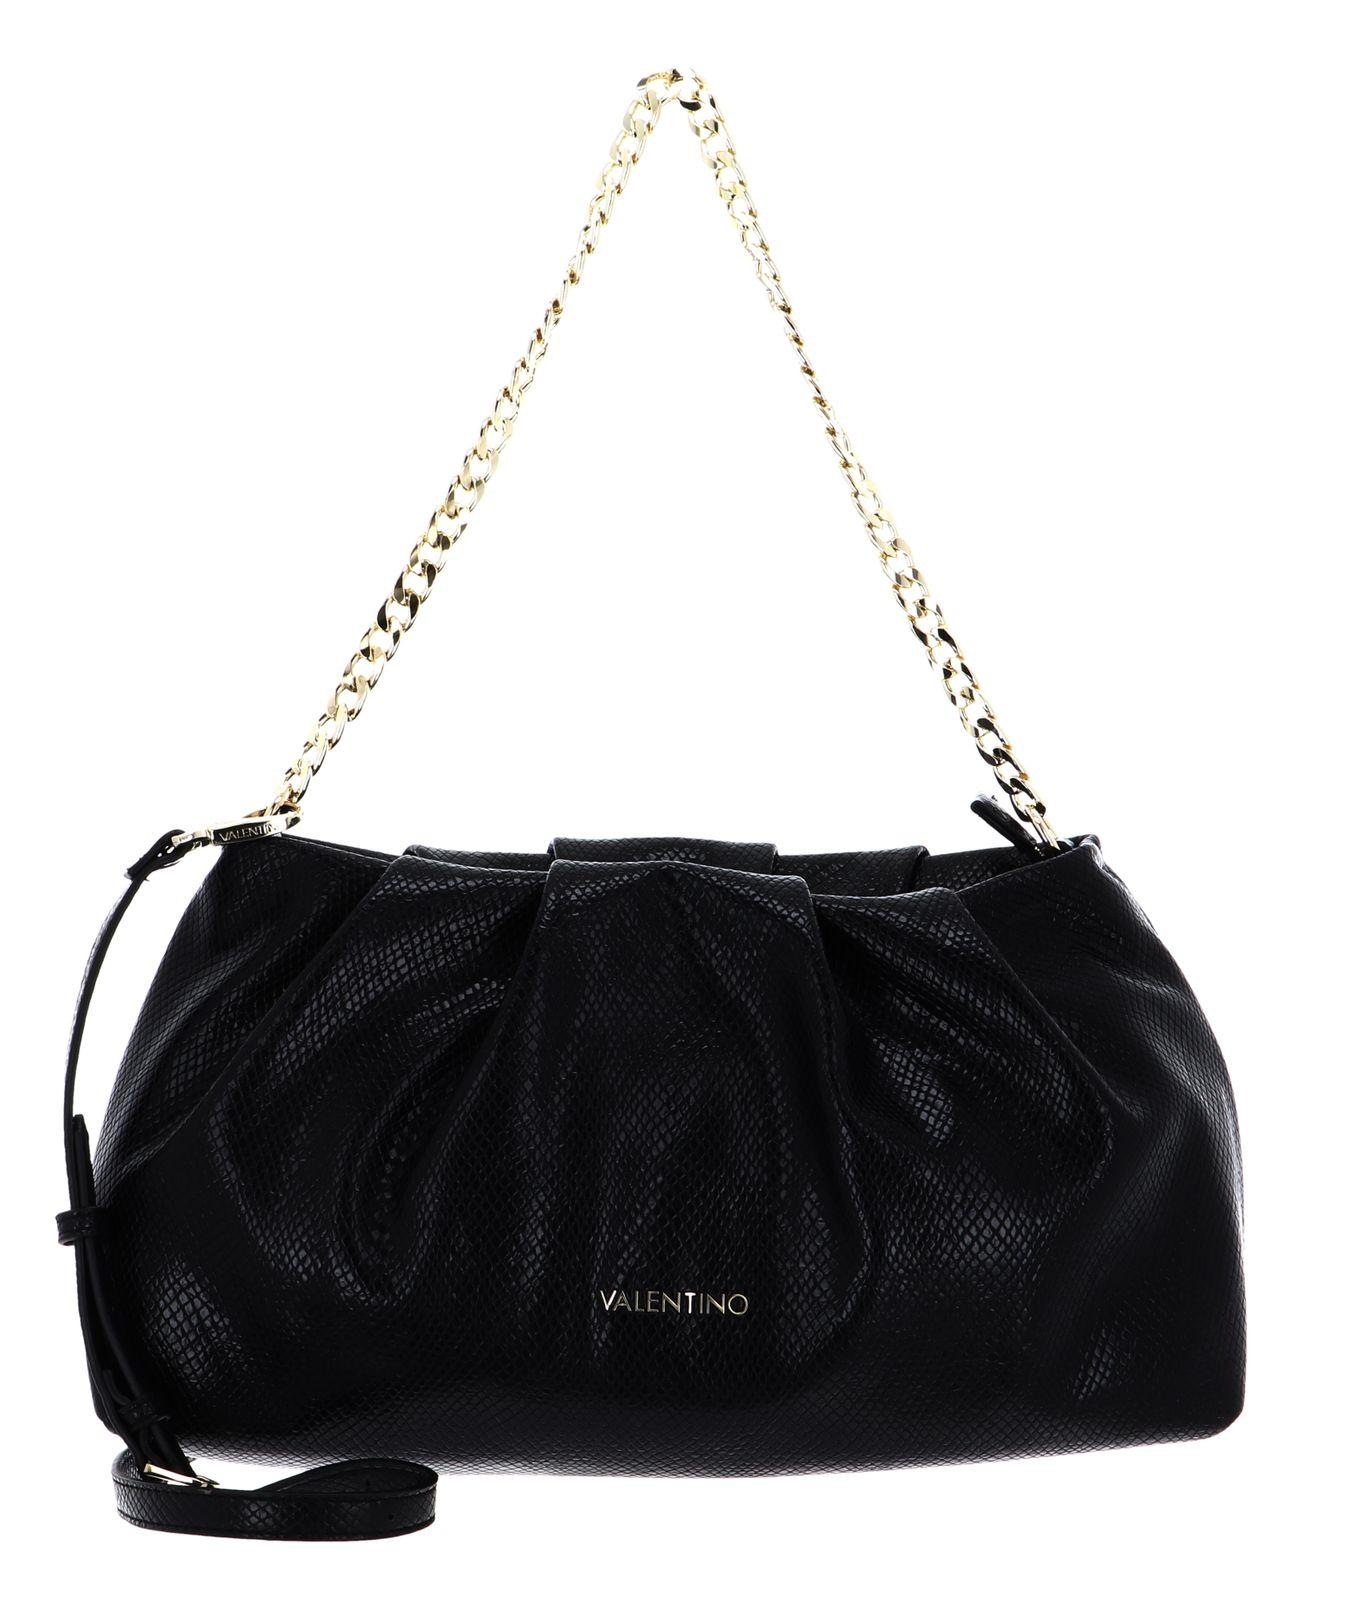 VALENTINO BAGS Poplar Shoulder Bag Nero